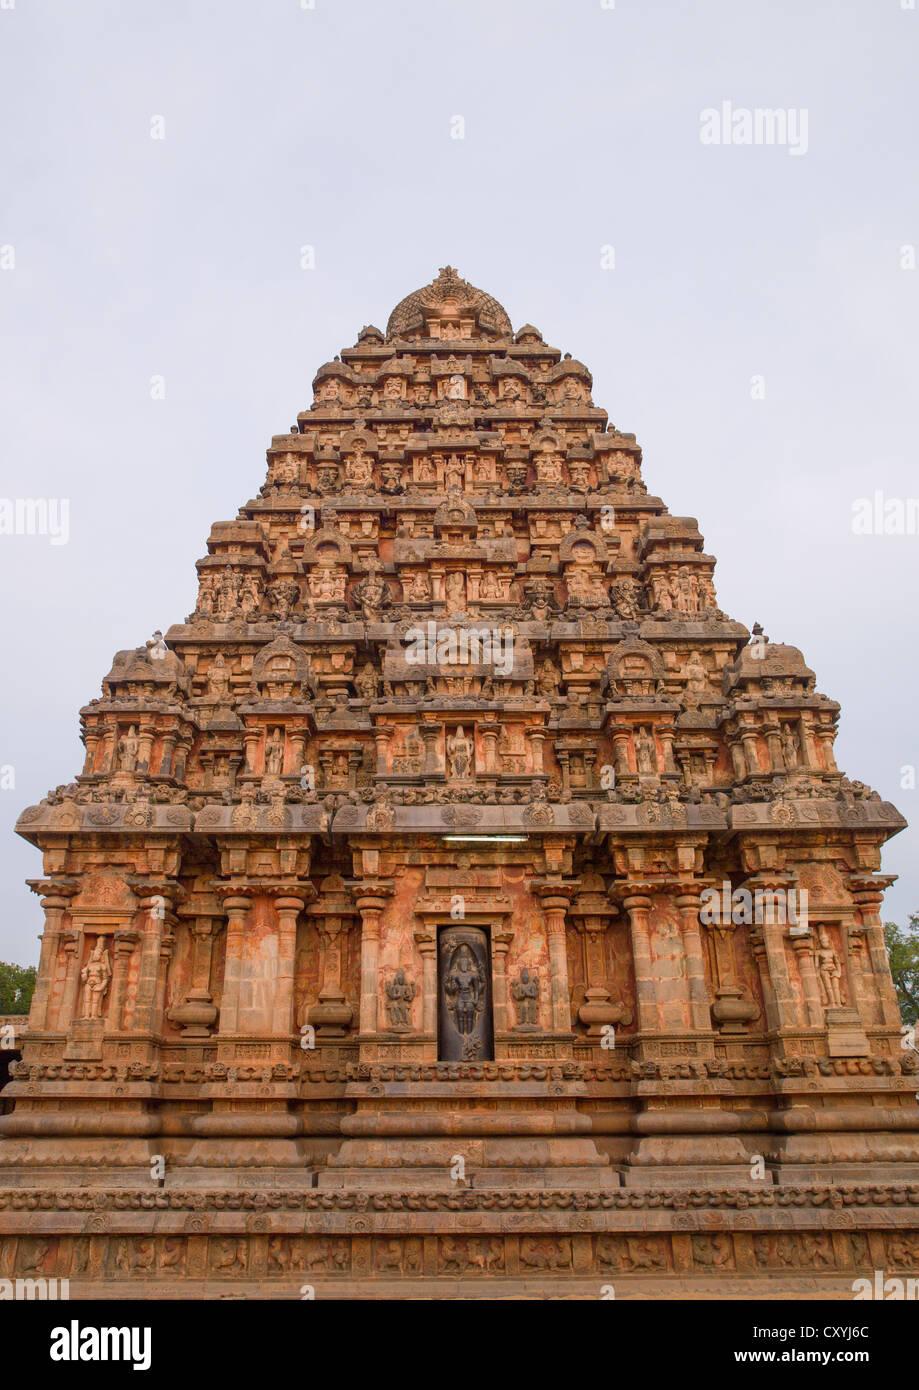 Carved Tower At The Airavatesvara Temple, Darasuram, India - Stock Image